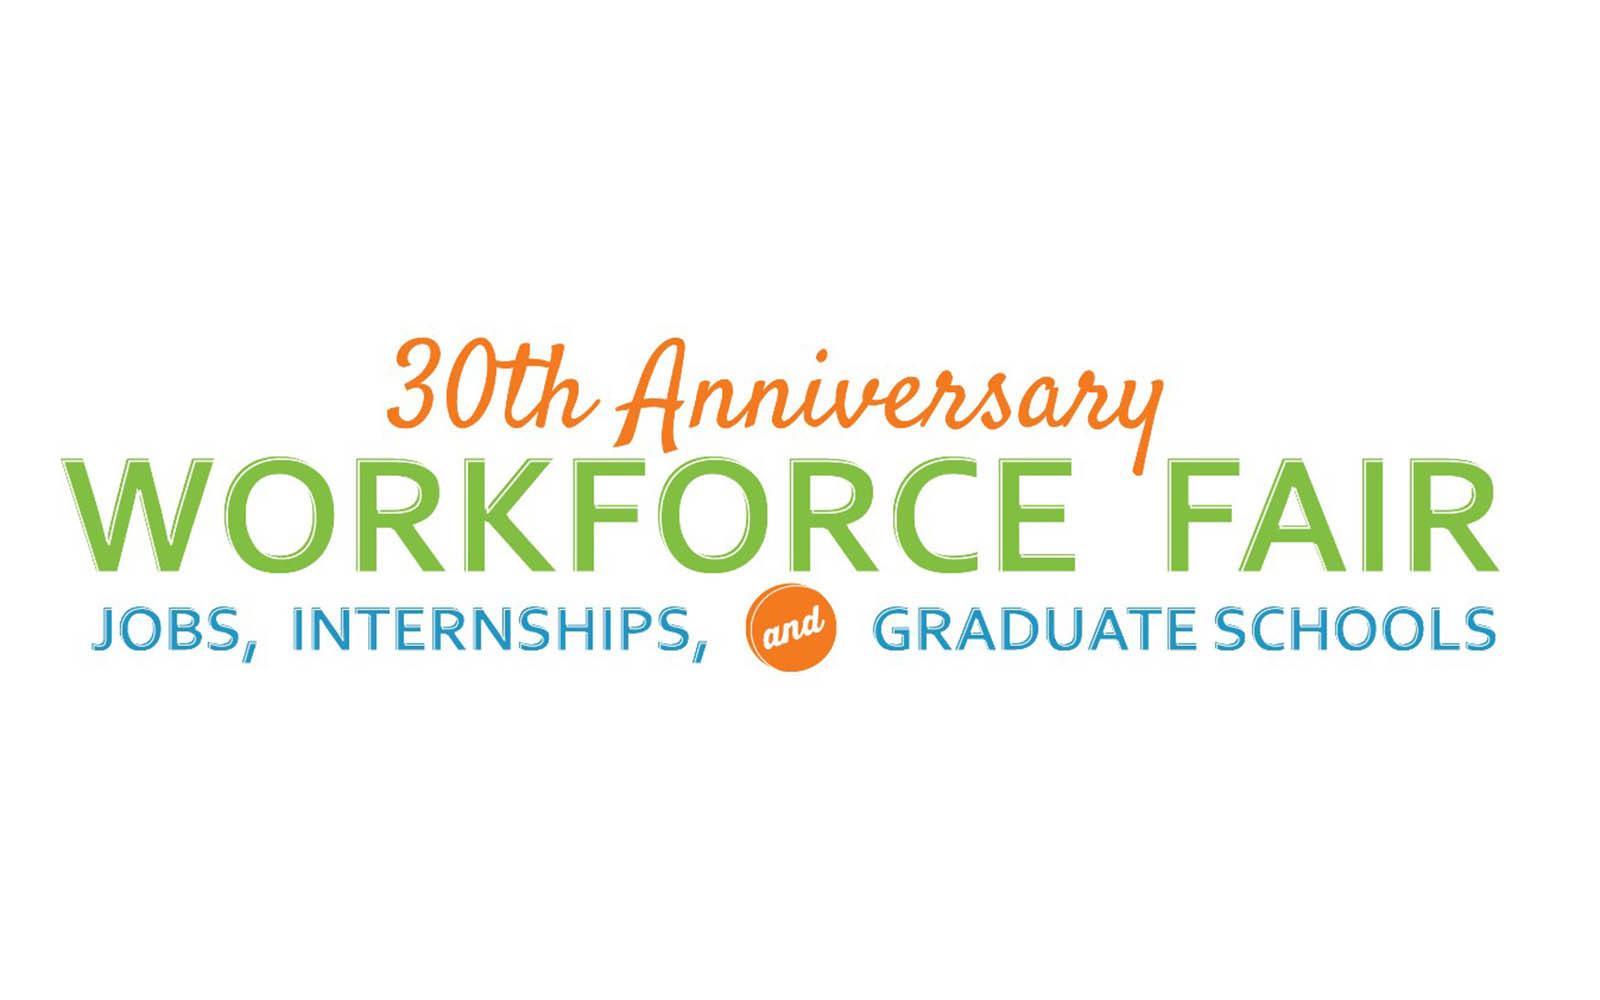 WorkForce Fair